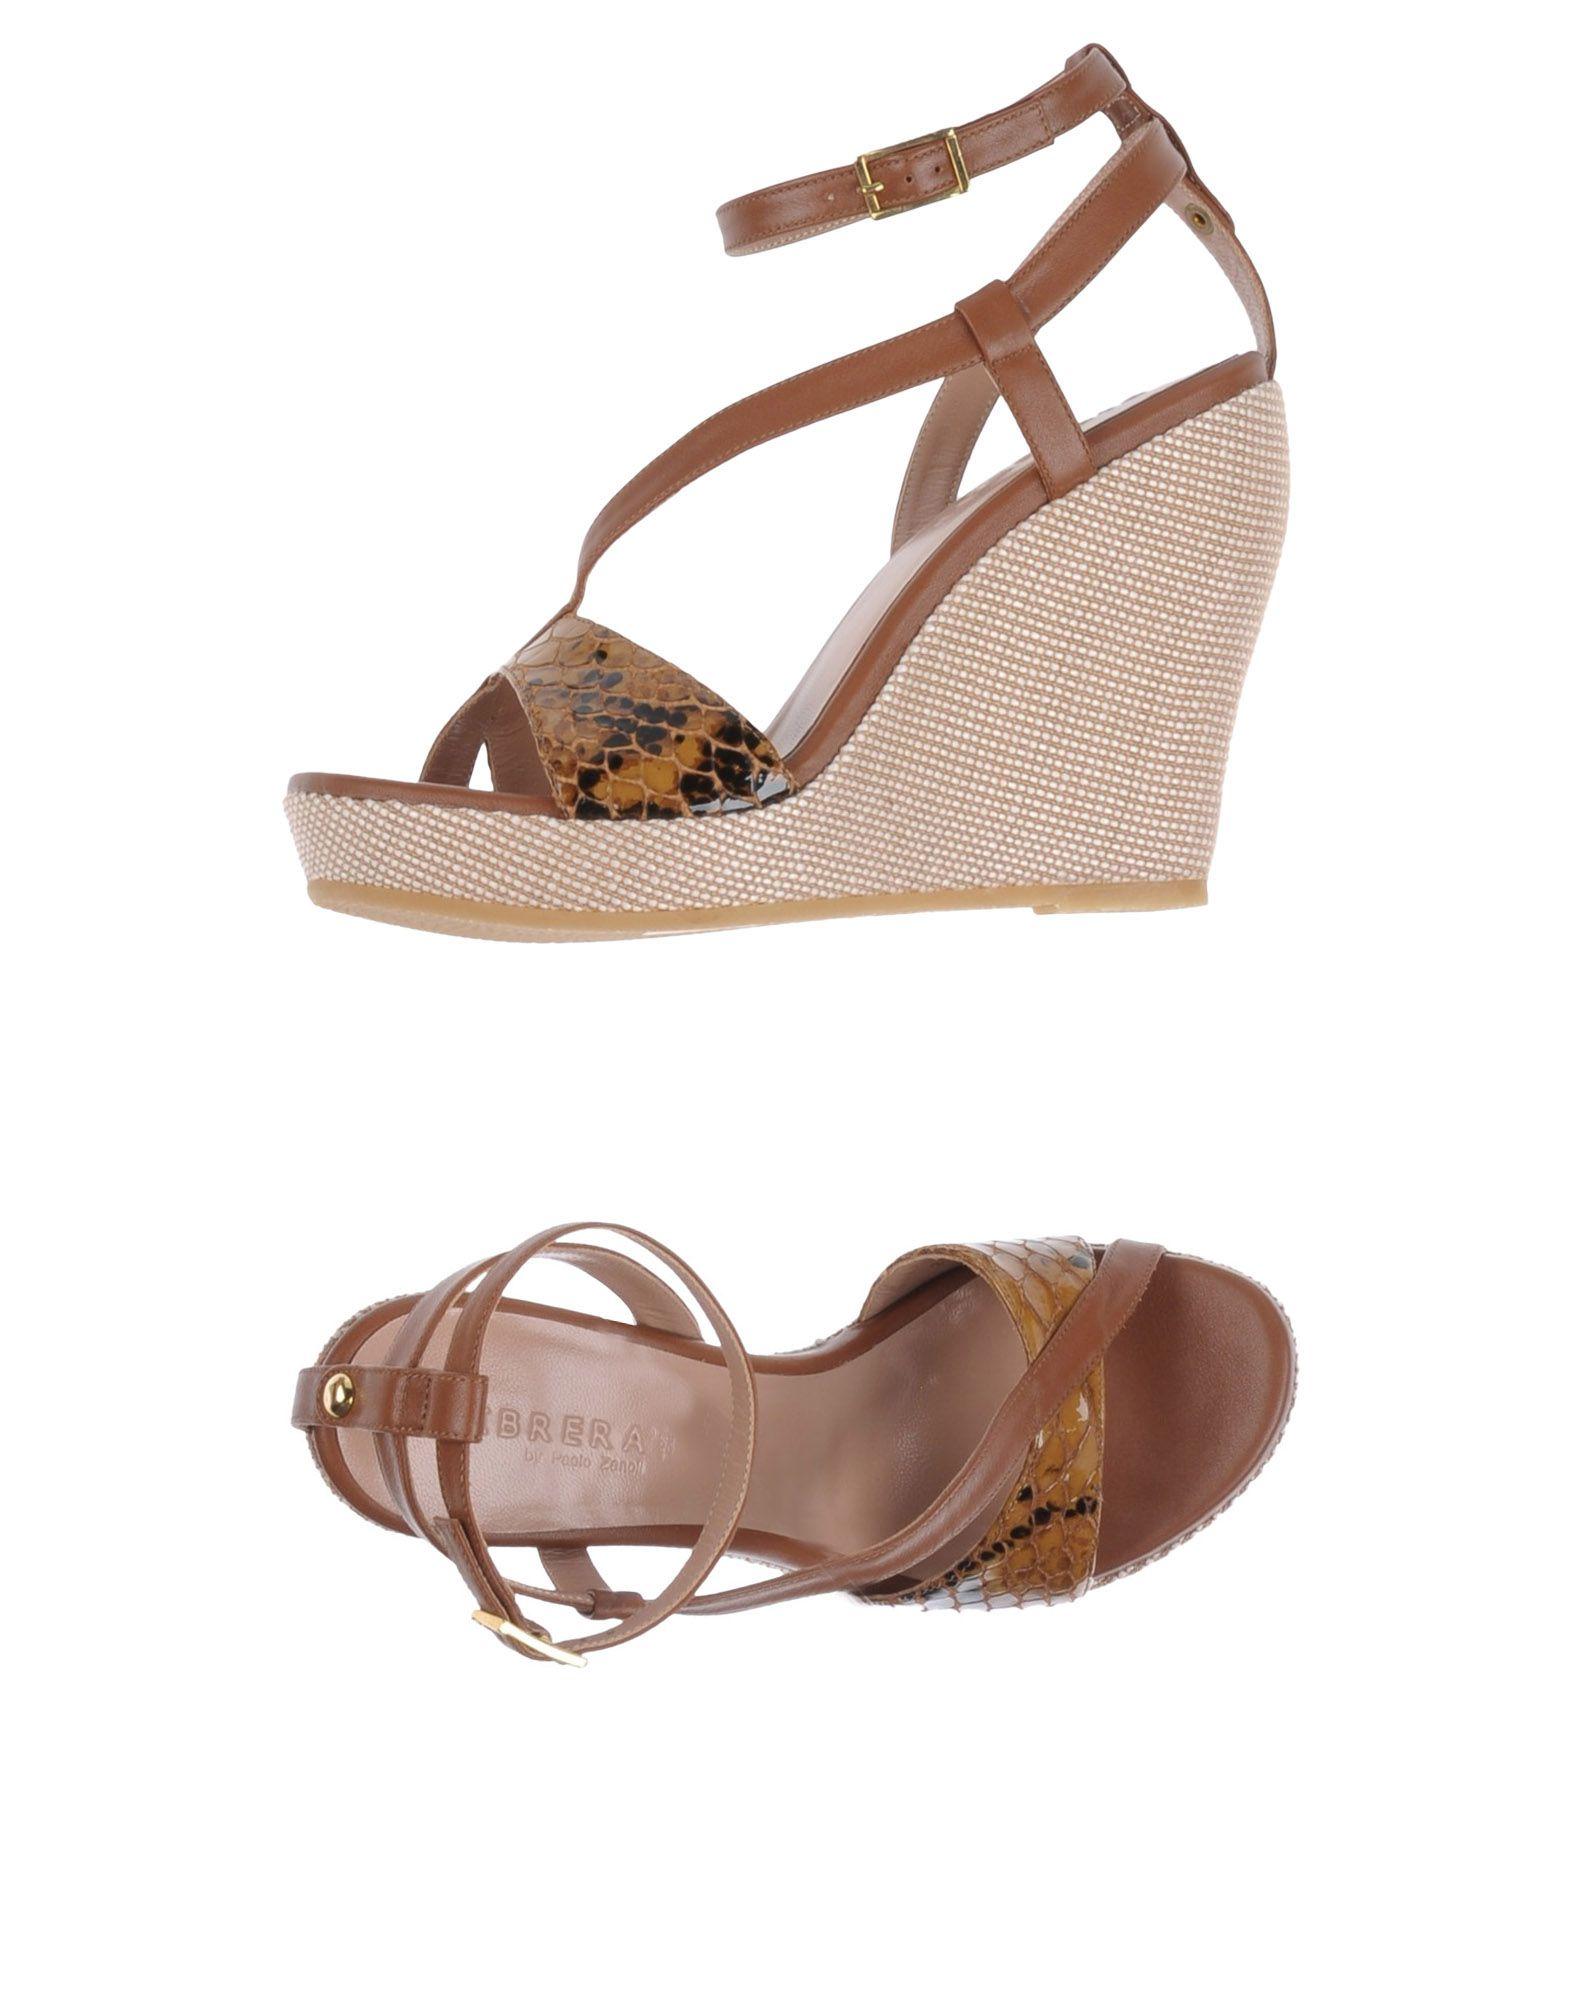 Sandales Dibrera By Paolo Zanoli Femme - Sandales Dibrera By Paolo Zanoli sur